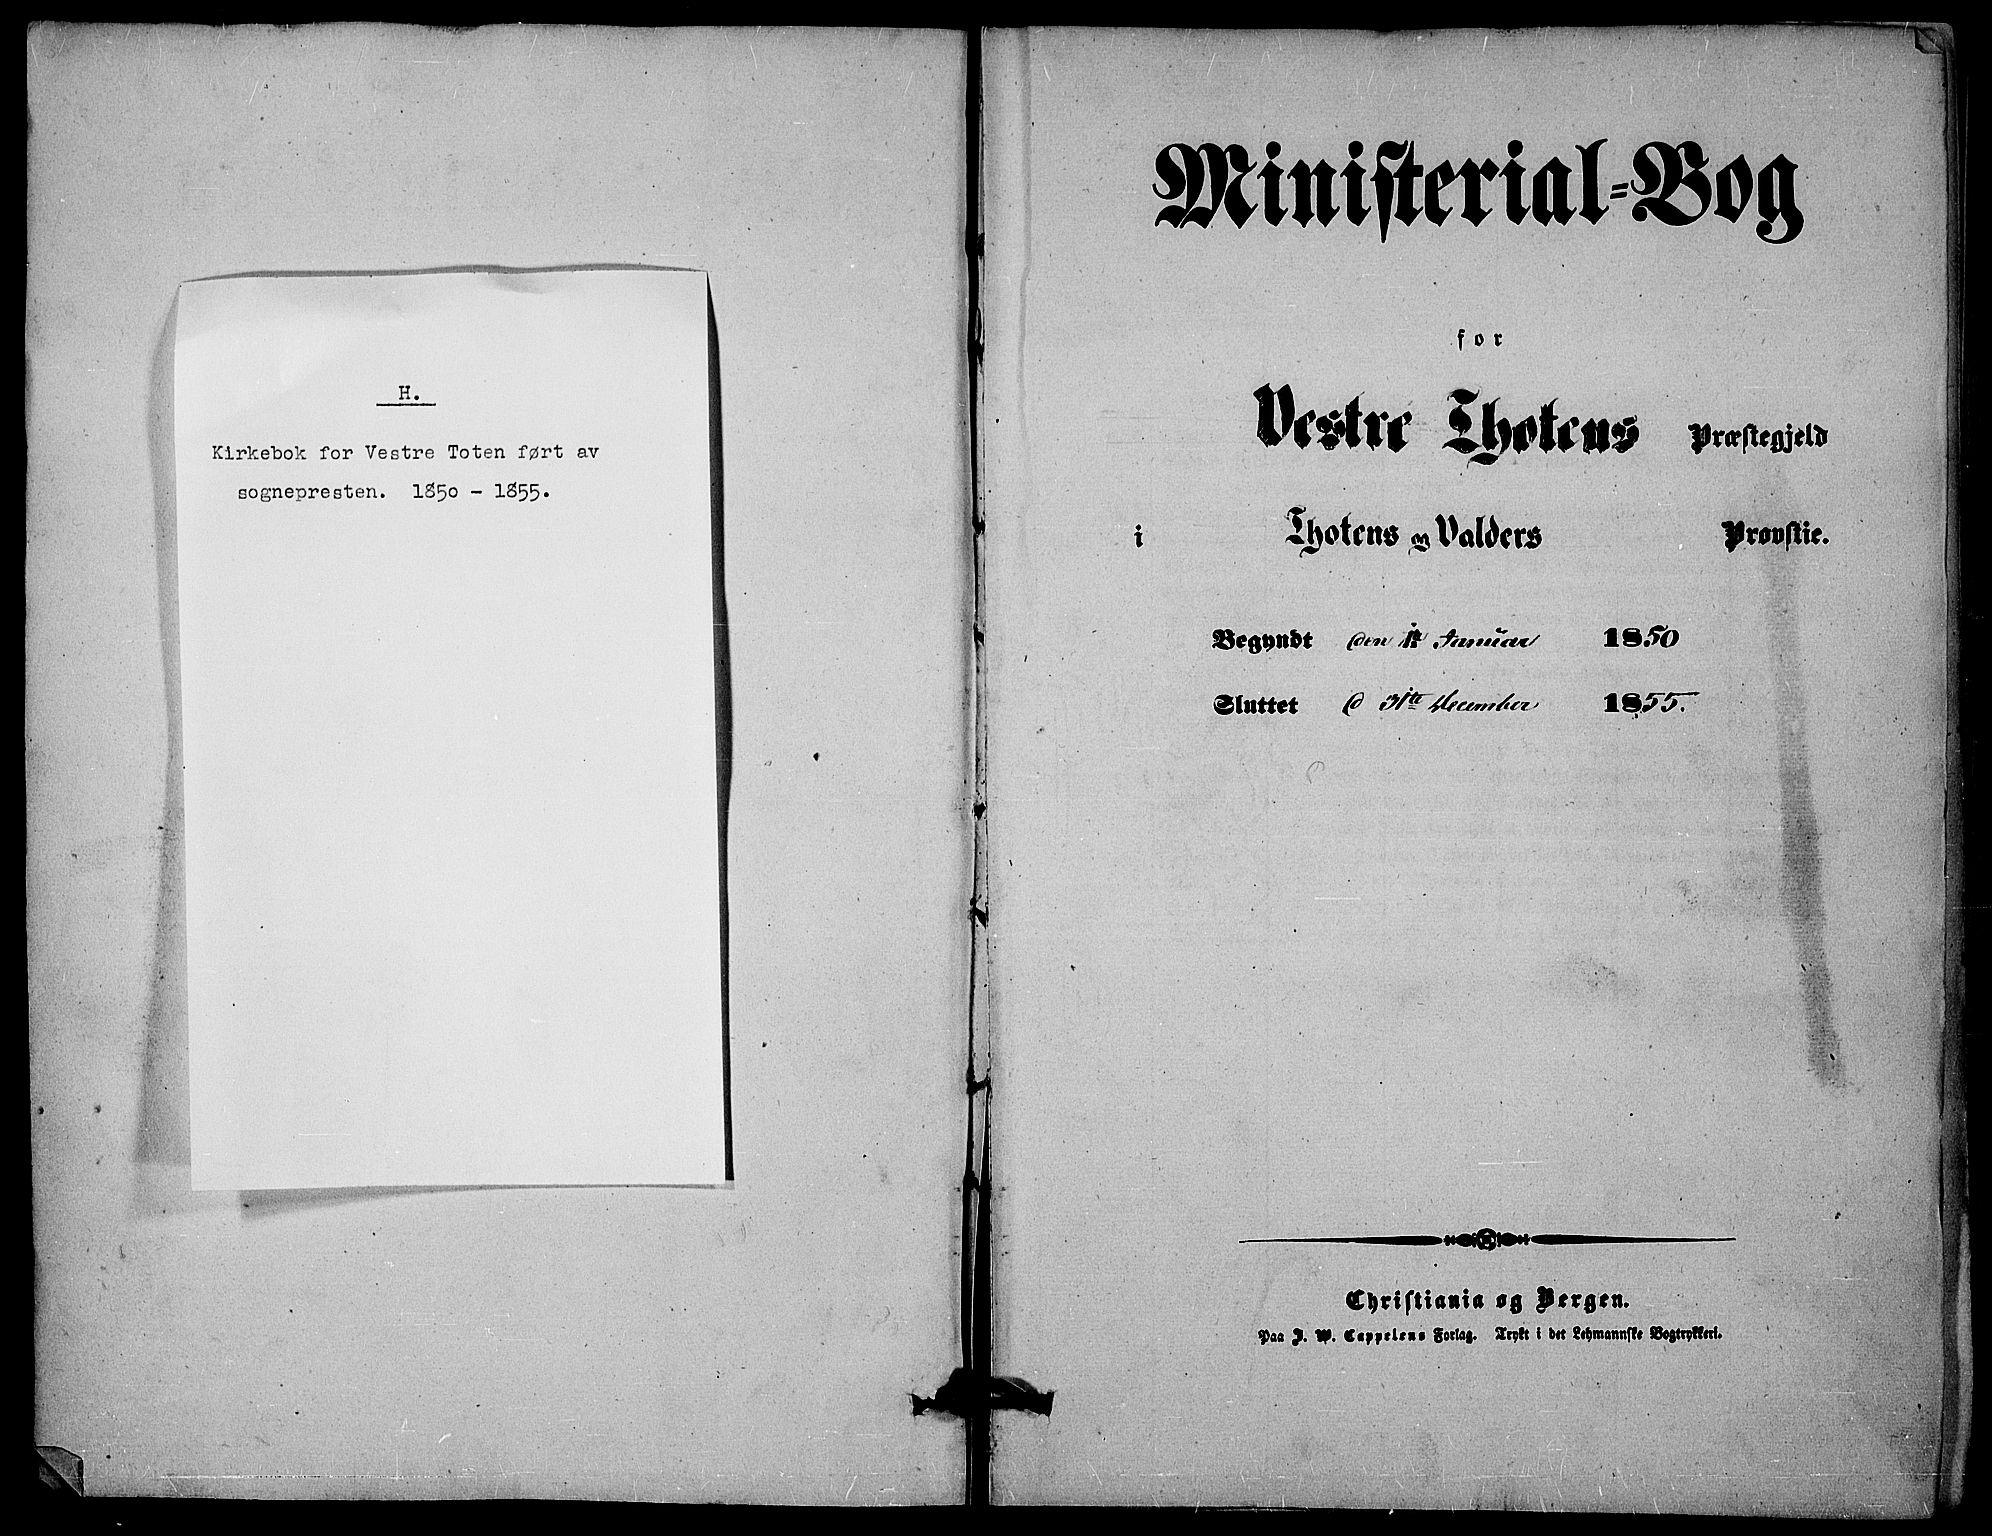 SAH, Vestre Toten prestekontor, Ministerialbok nr. 5, 1850-1855